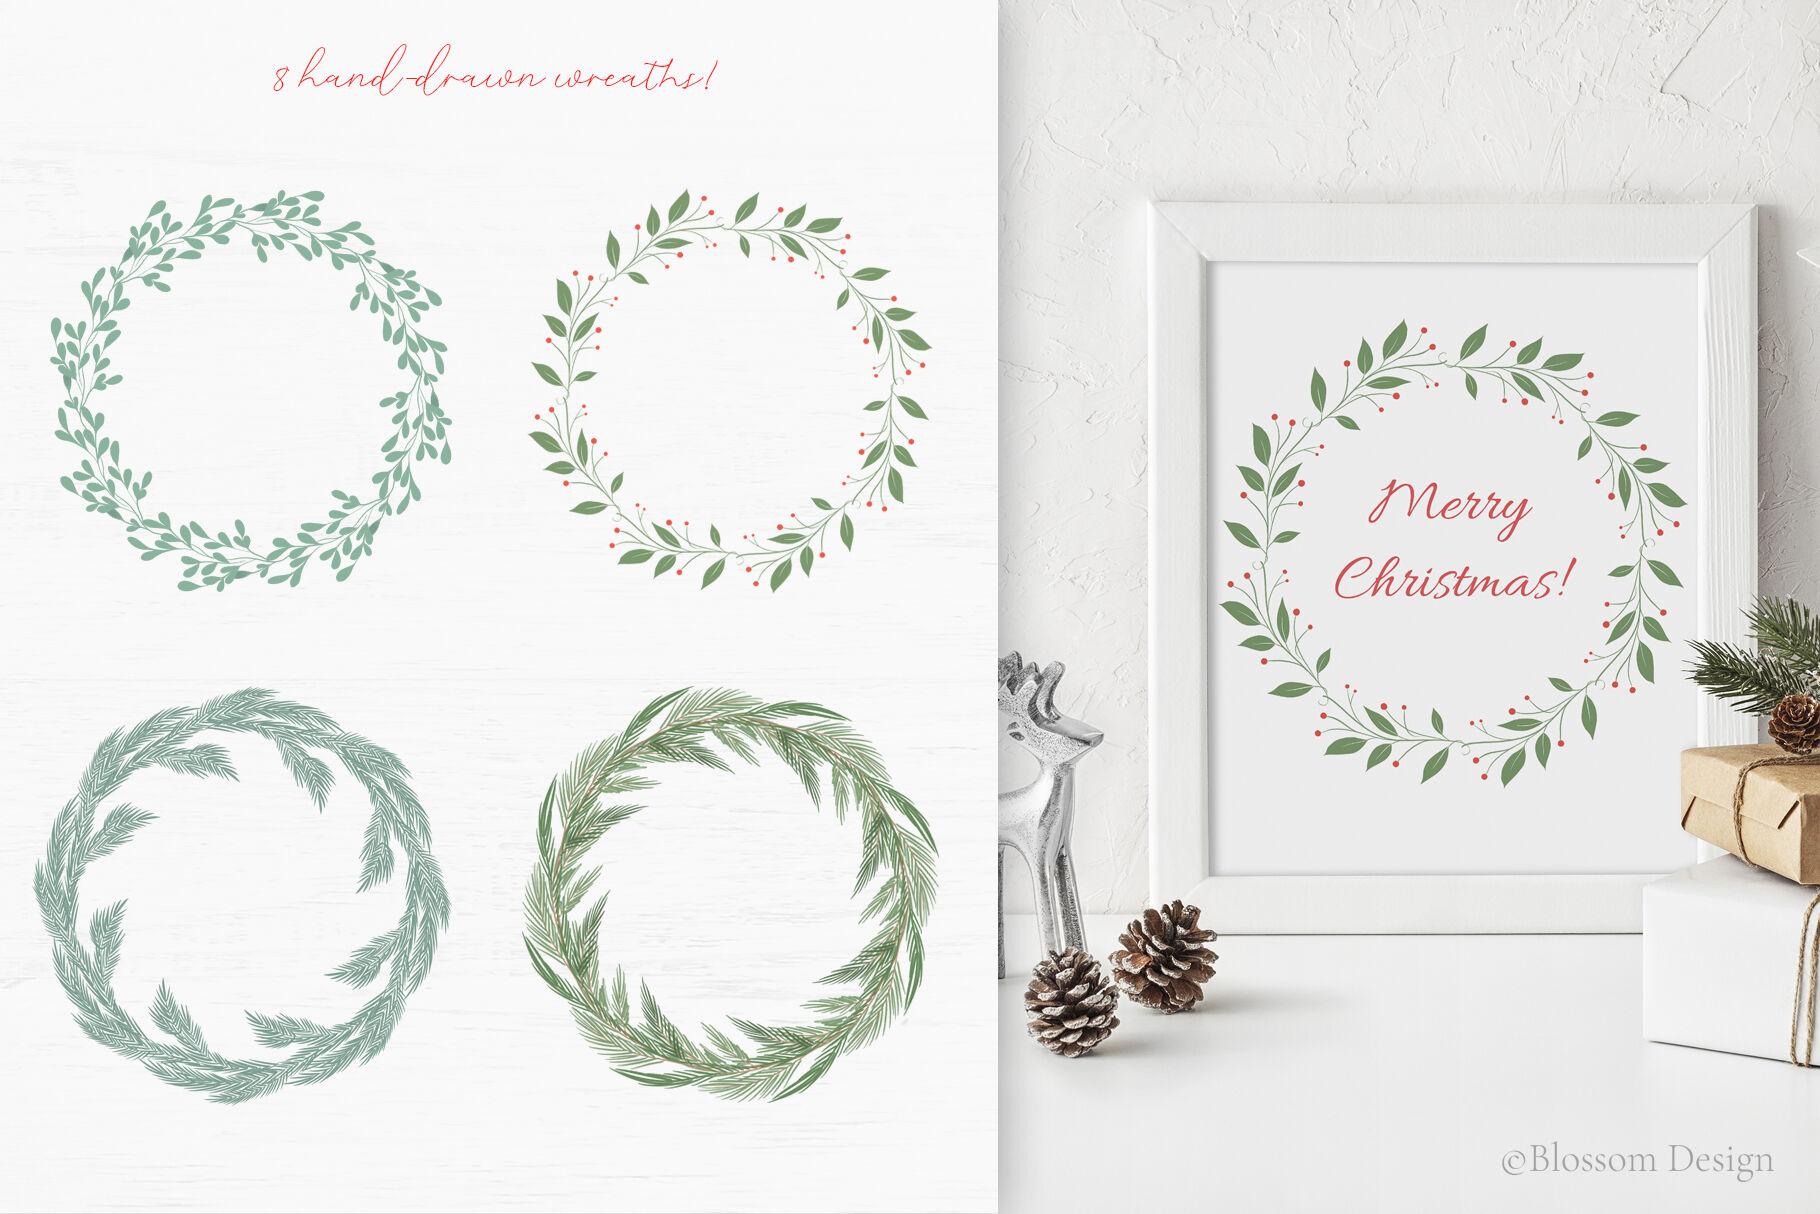 Merry Christmas Collection By Blossom Design Thehungryjpeg Com